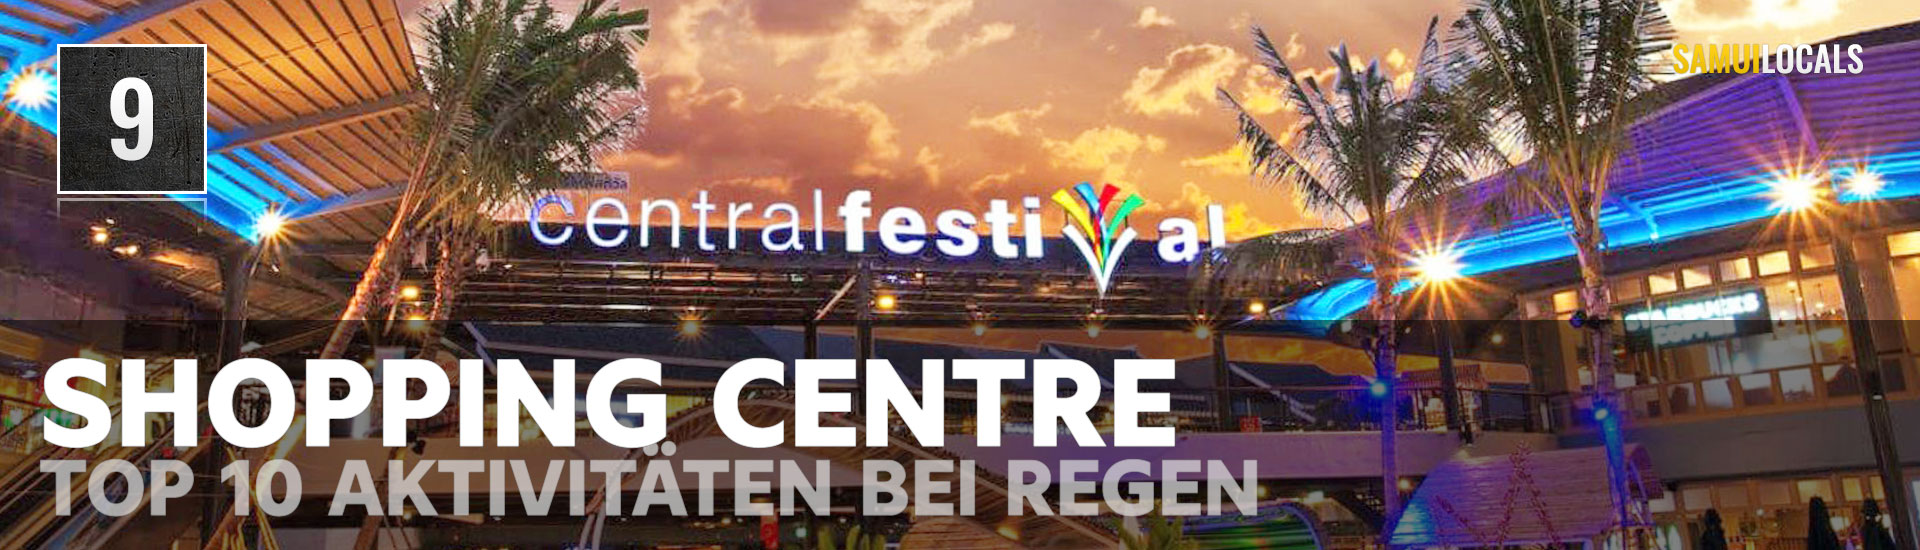 top_10_aktivitaeten_bei_regen_central_festival